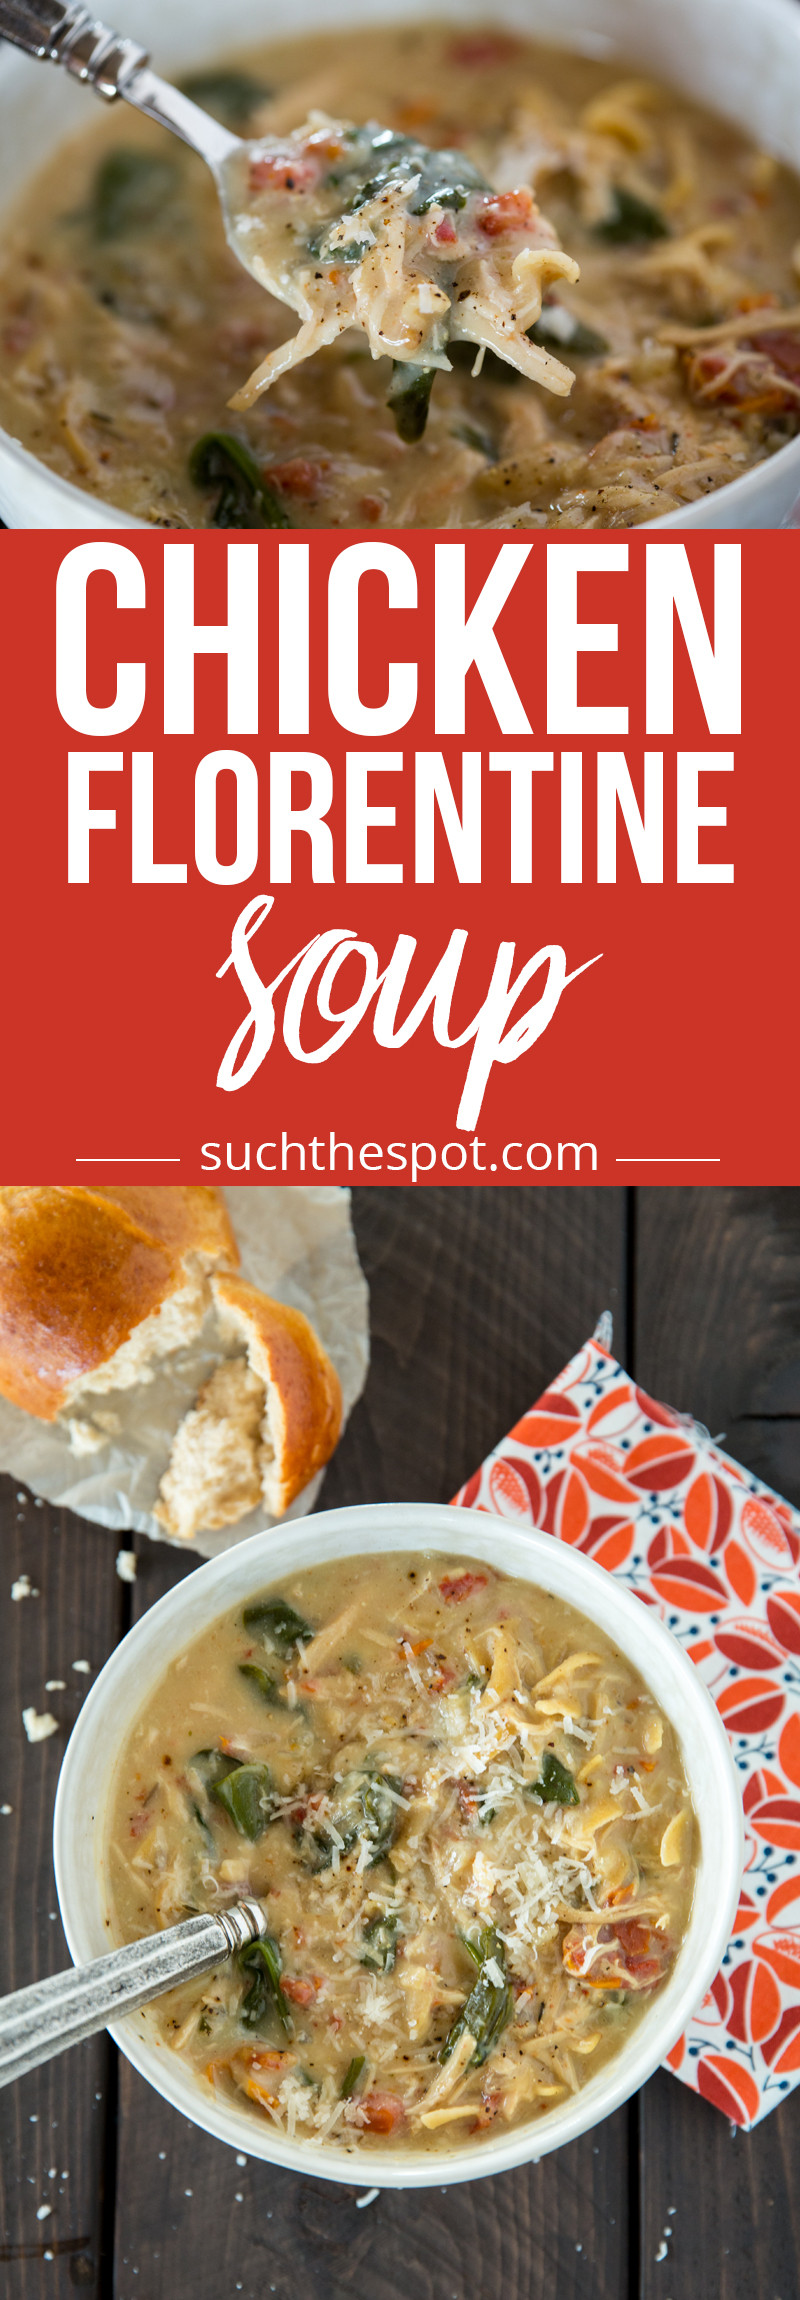 Chicken Florentine Soup  Chicken Florentine Soup